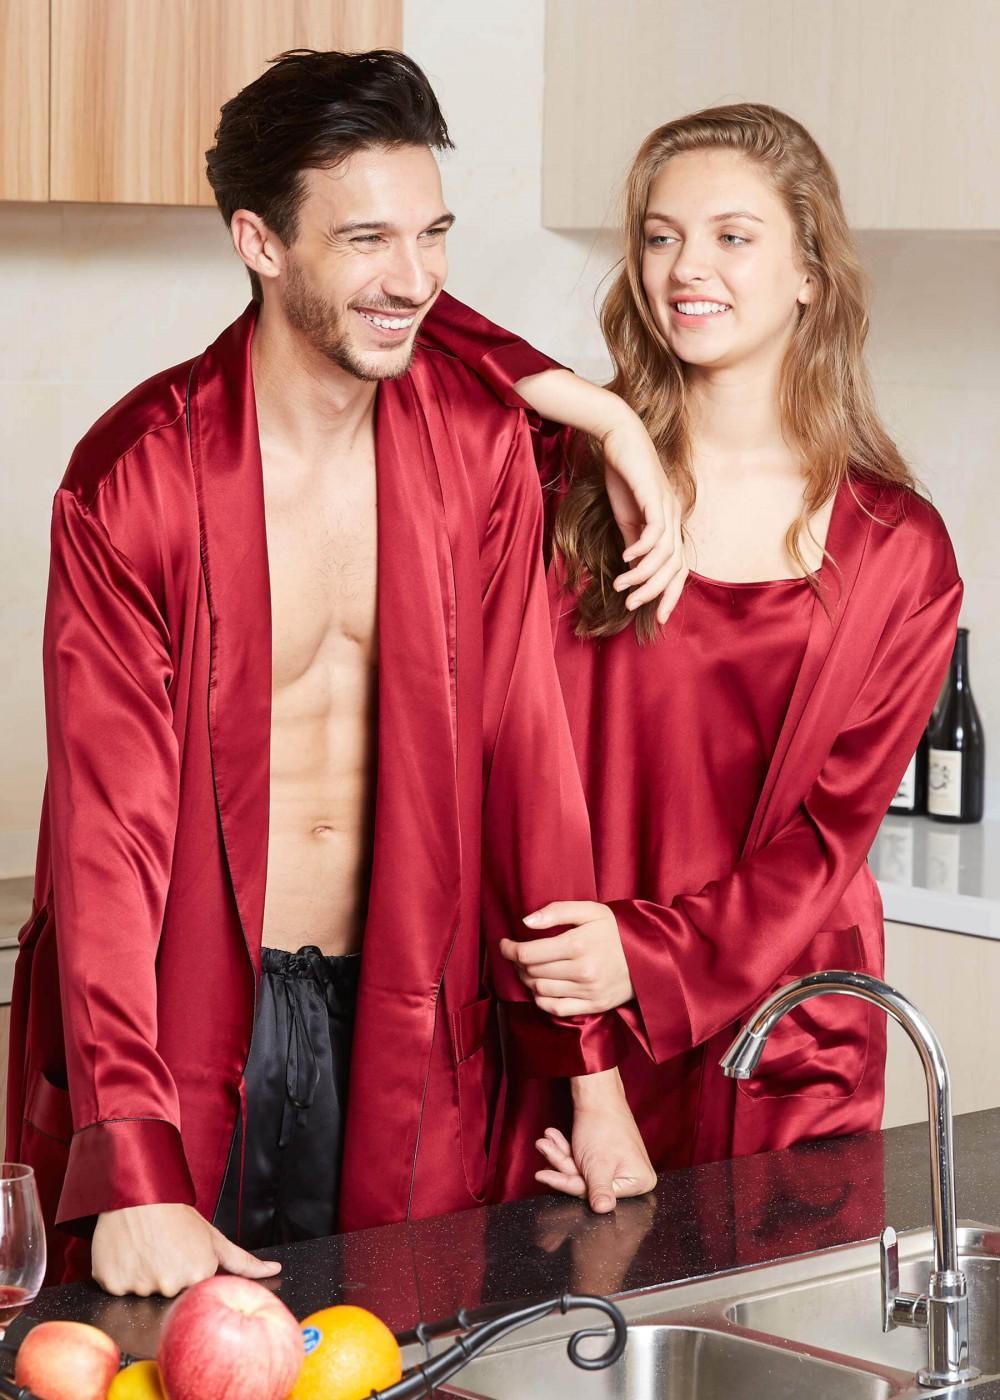 Fashion Up Satin Silk Nighty Gown For Couple, camisole, girls nighties, sleepwear, silk nighties, 3 piece nighty, silk robe, night gowns, nighty dress for girl, nightwear, bridal nighty (Maroon).